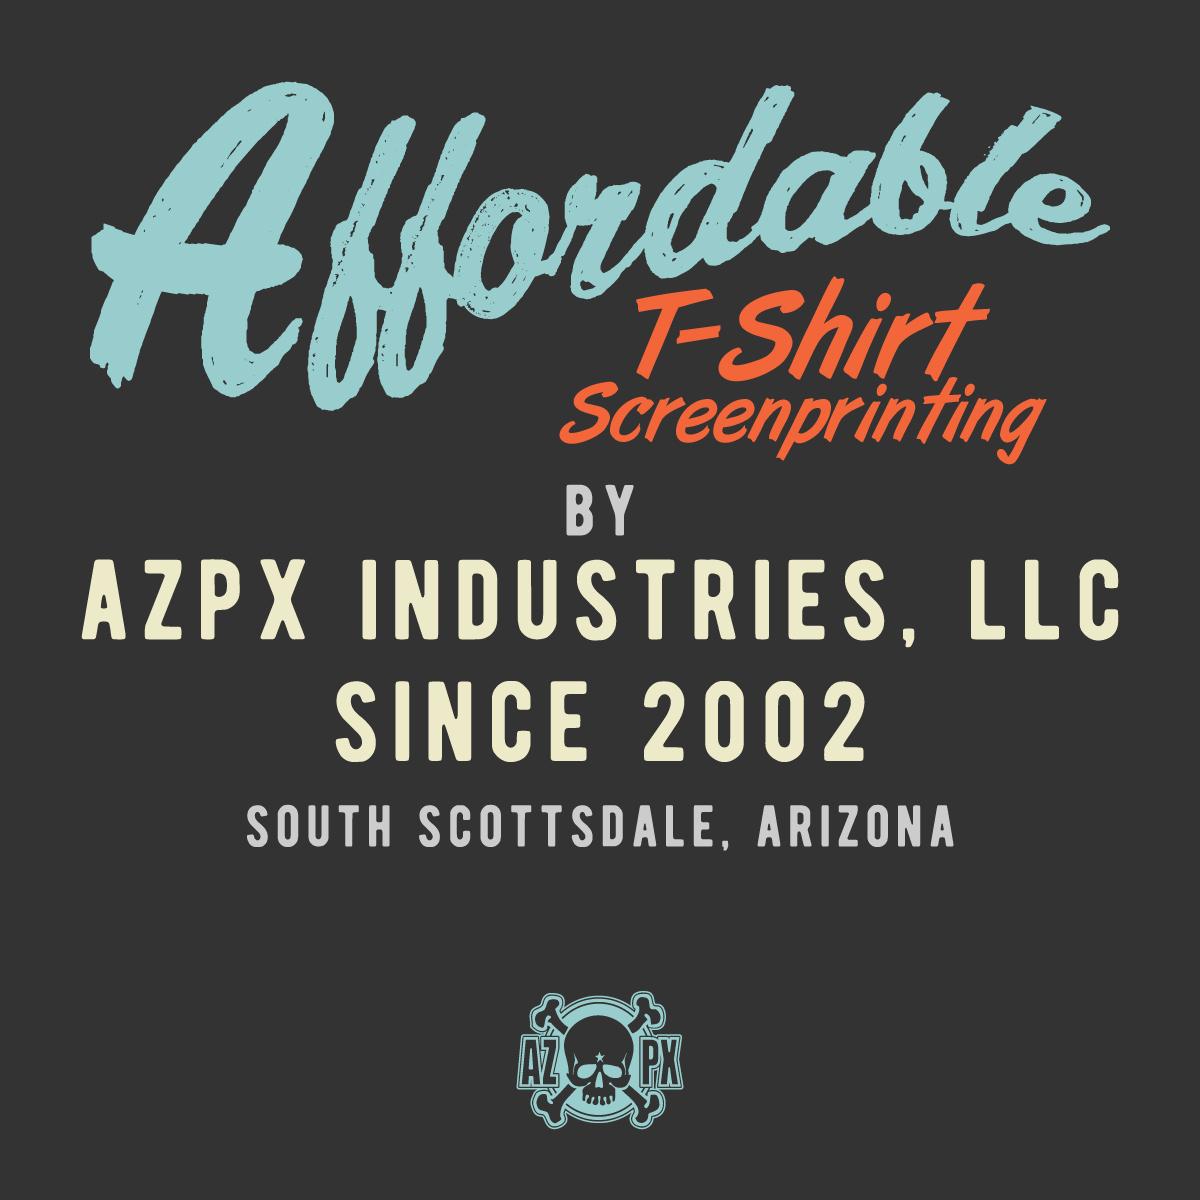 Affordable T Shirt Screenprinting By Azpx Industries Llc Since 2002